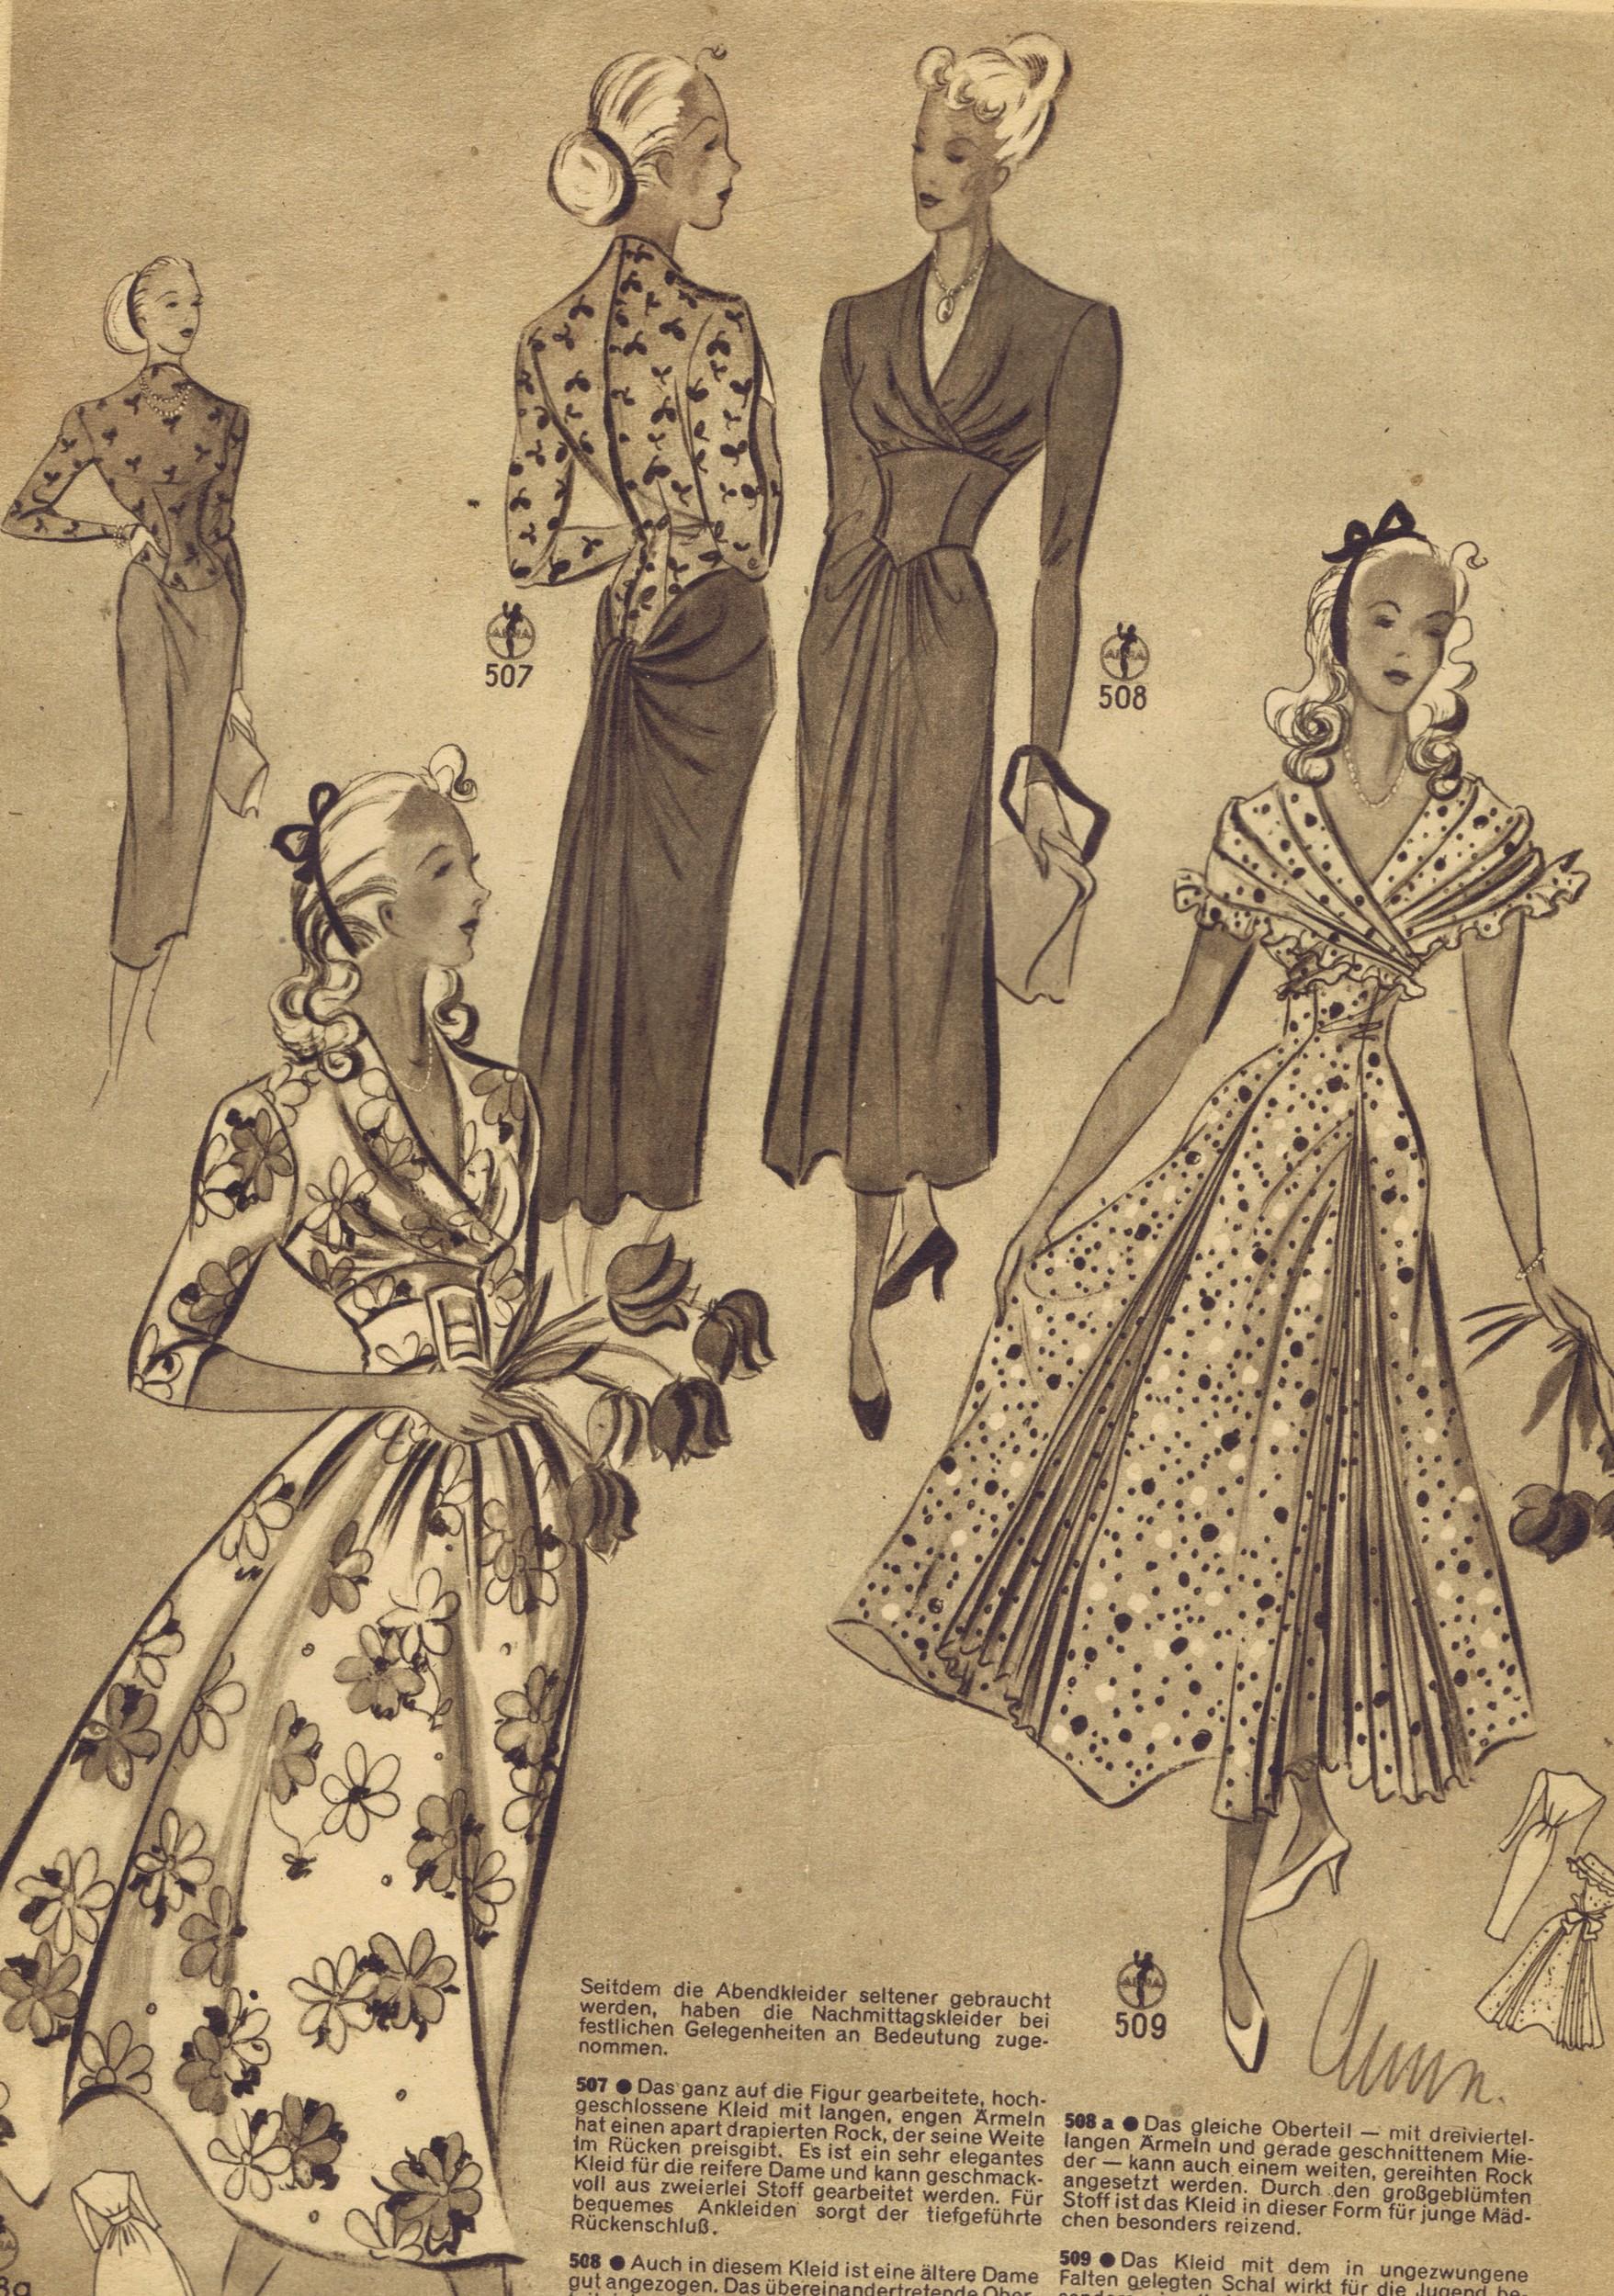 Free vintage 1940s sewing patterns german die alma mode vintage free vintage 1940s sewing patterns german die alma mode jeuxipadfo Choice Image